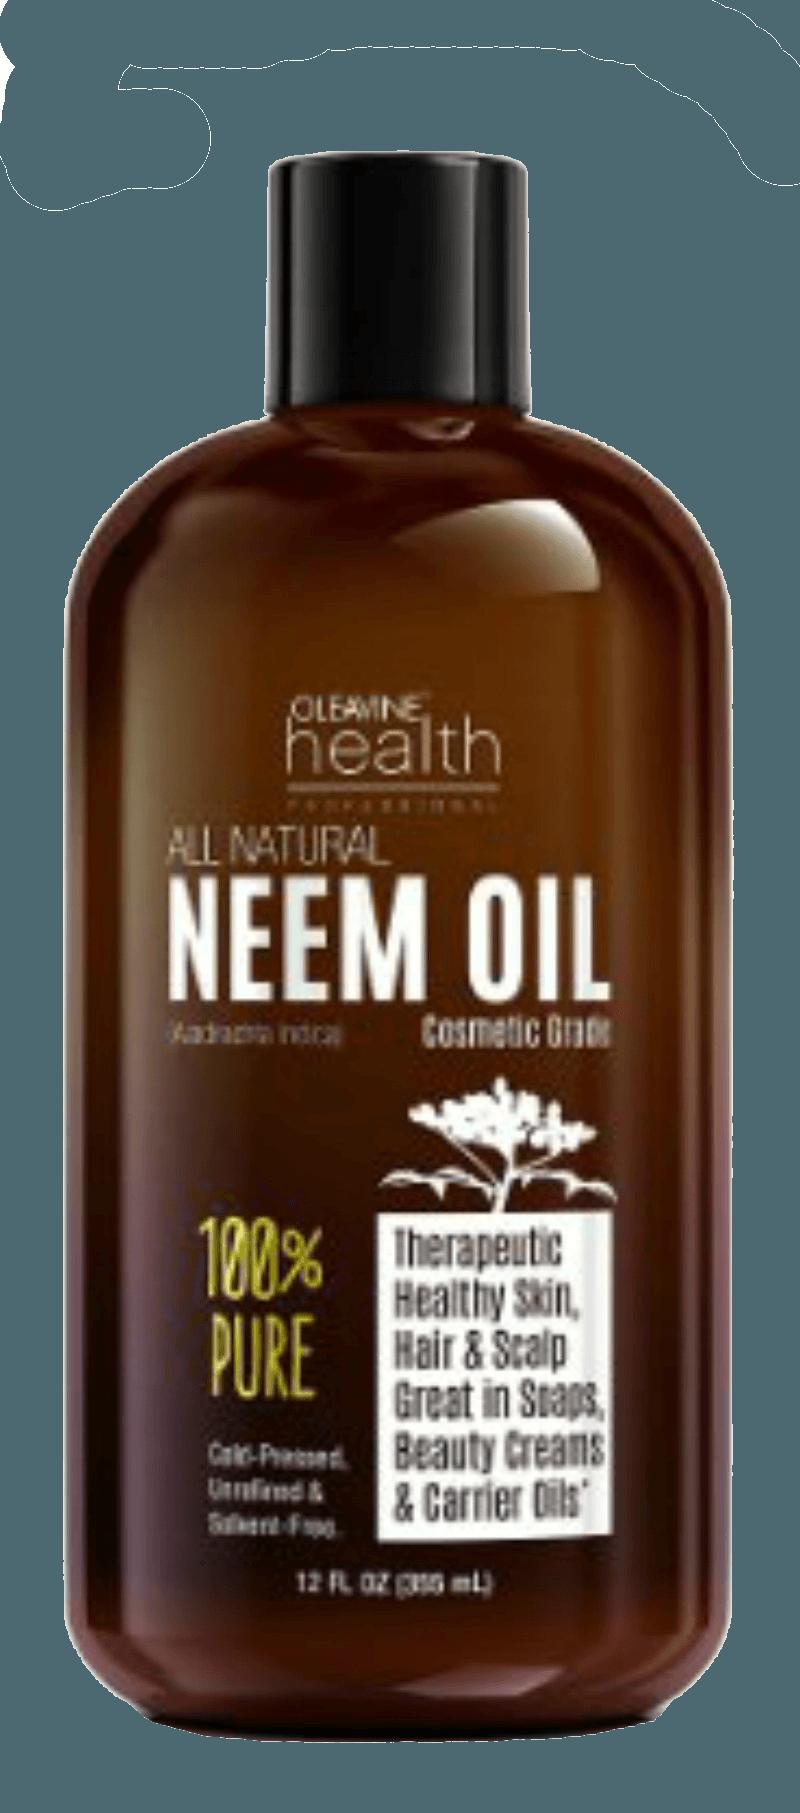 Discover the Wonder of Neem Oil by Oleavine - Jaxsology